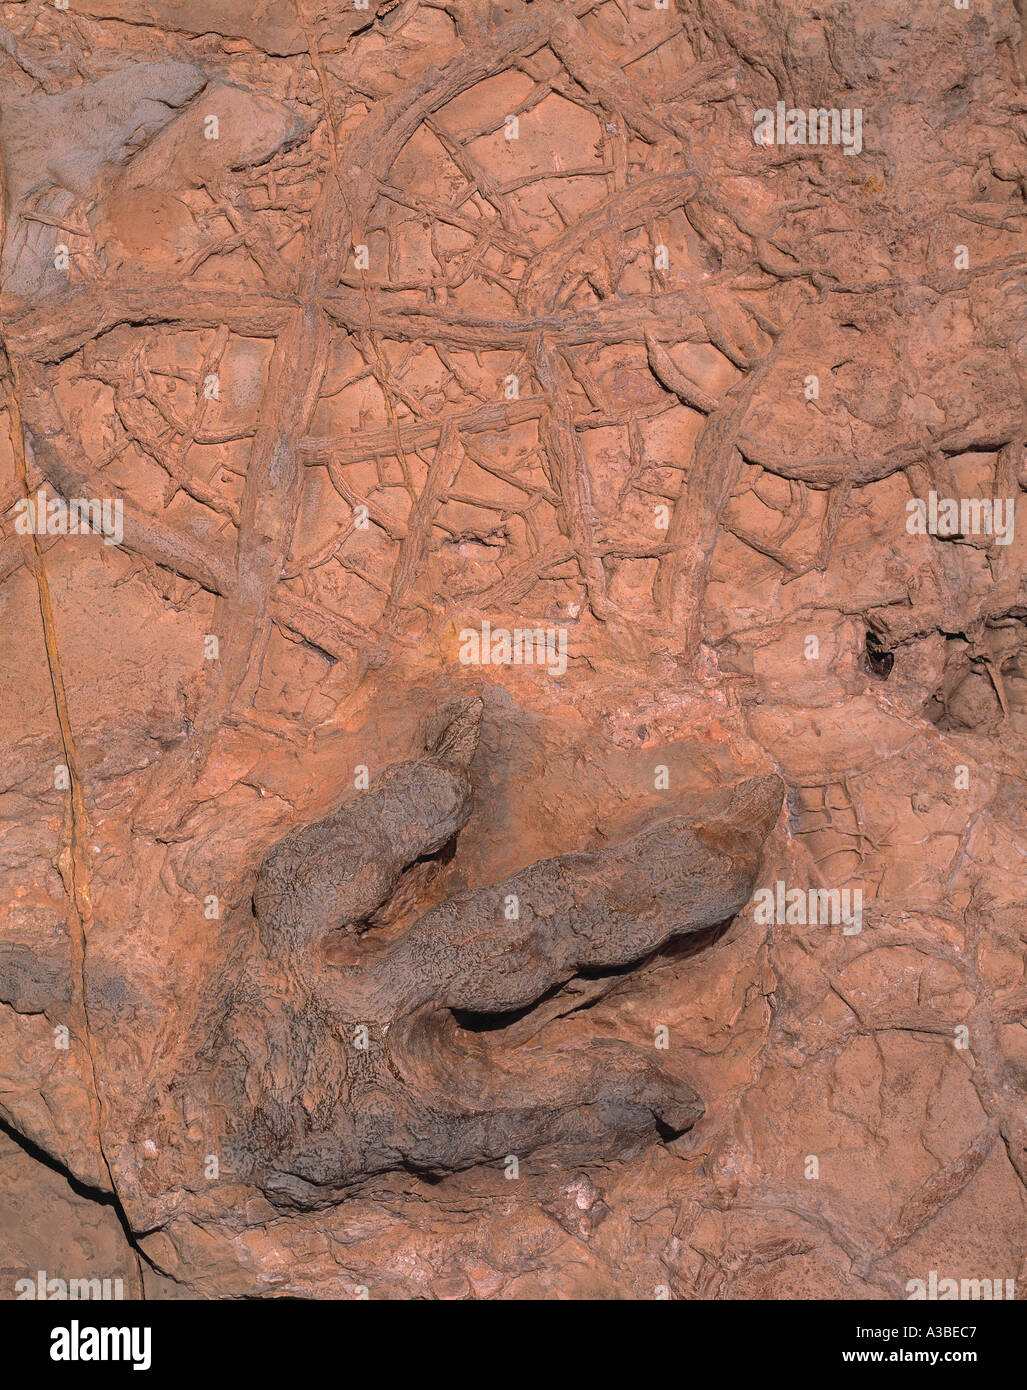 Diplophosaurus Footprint Natural Fossil Cast of Jurassic Dinosaur Foot Johnson Dinosaur Site Utah - Stock Image